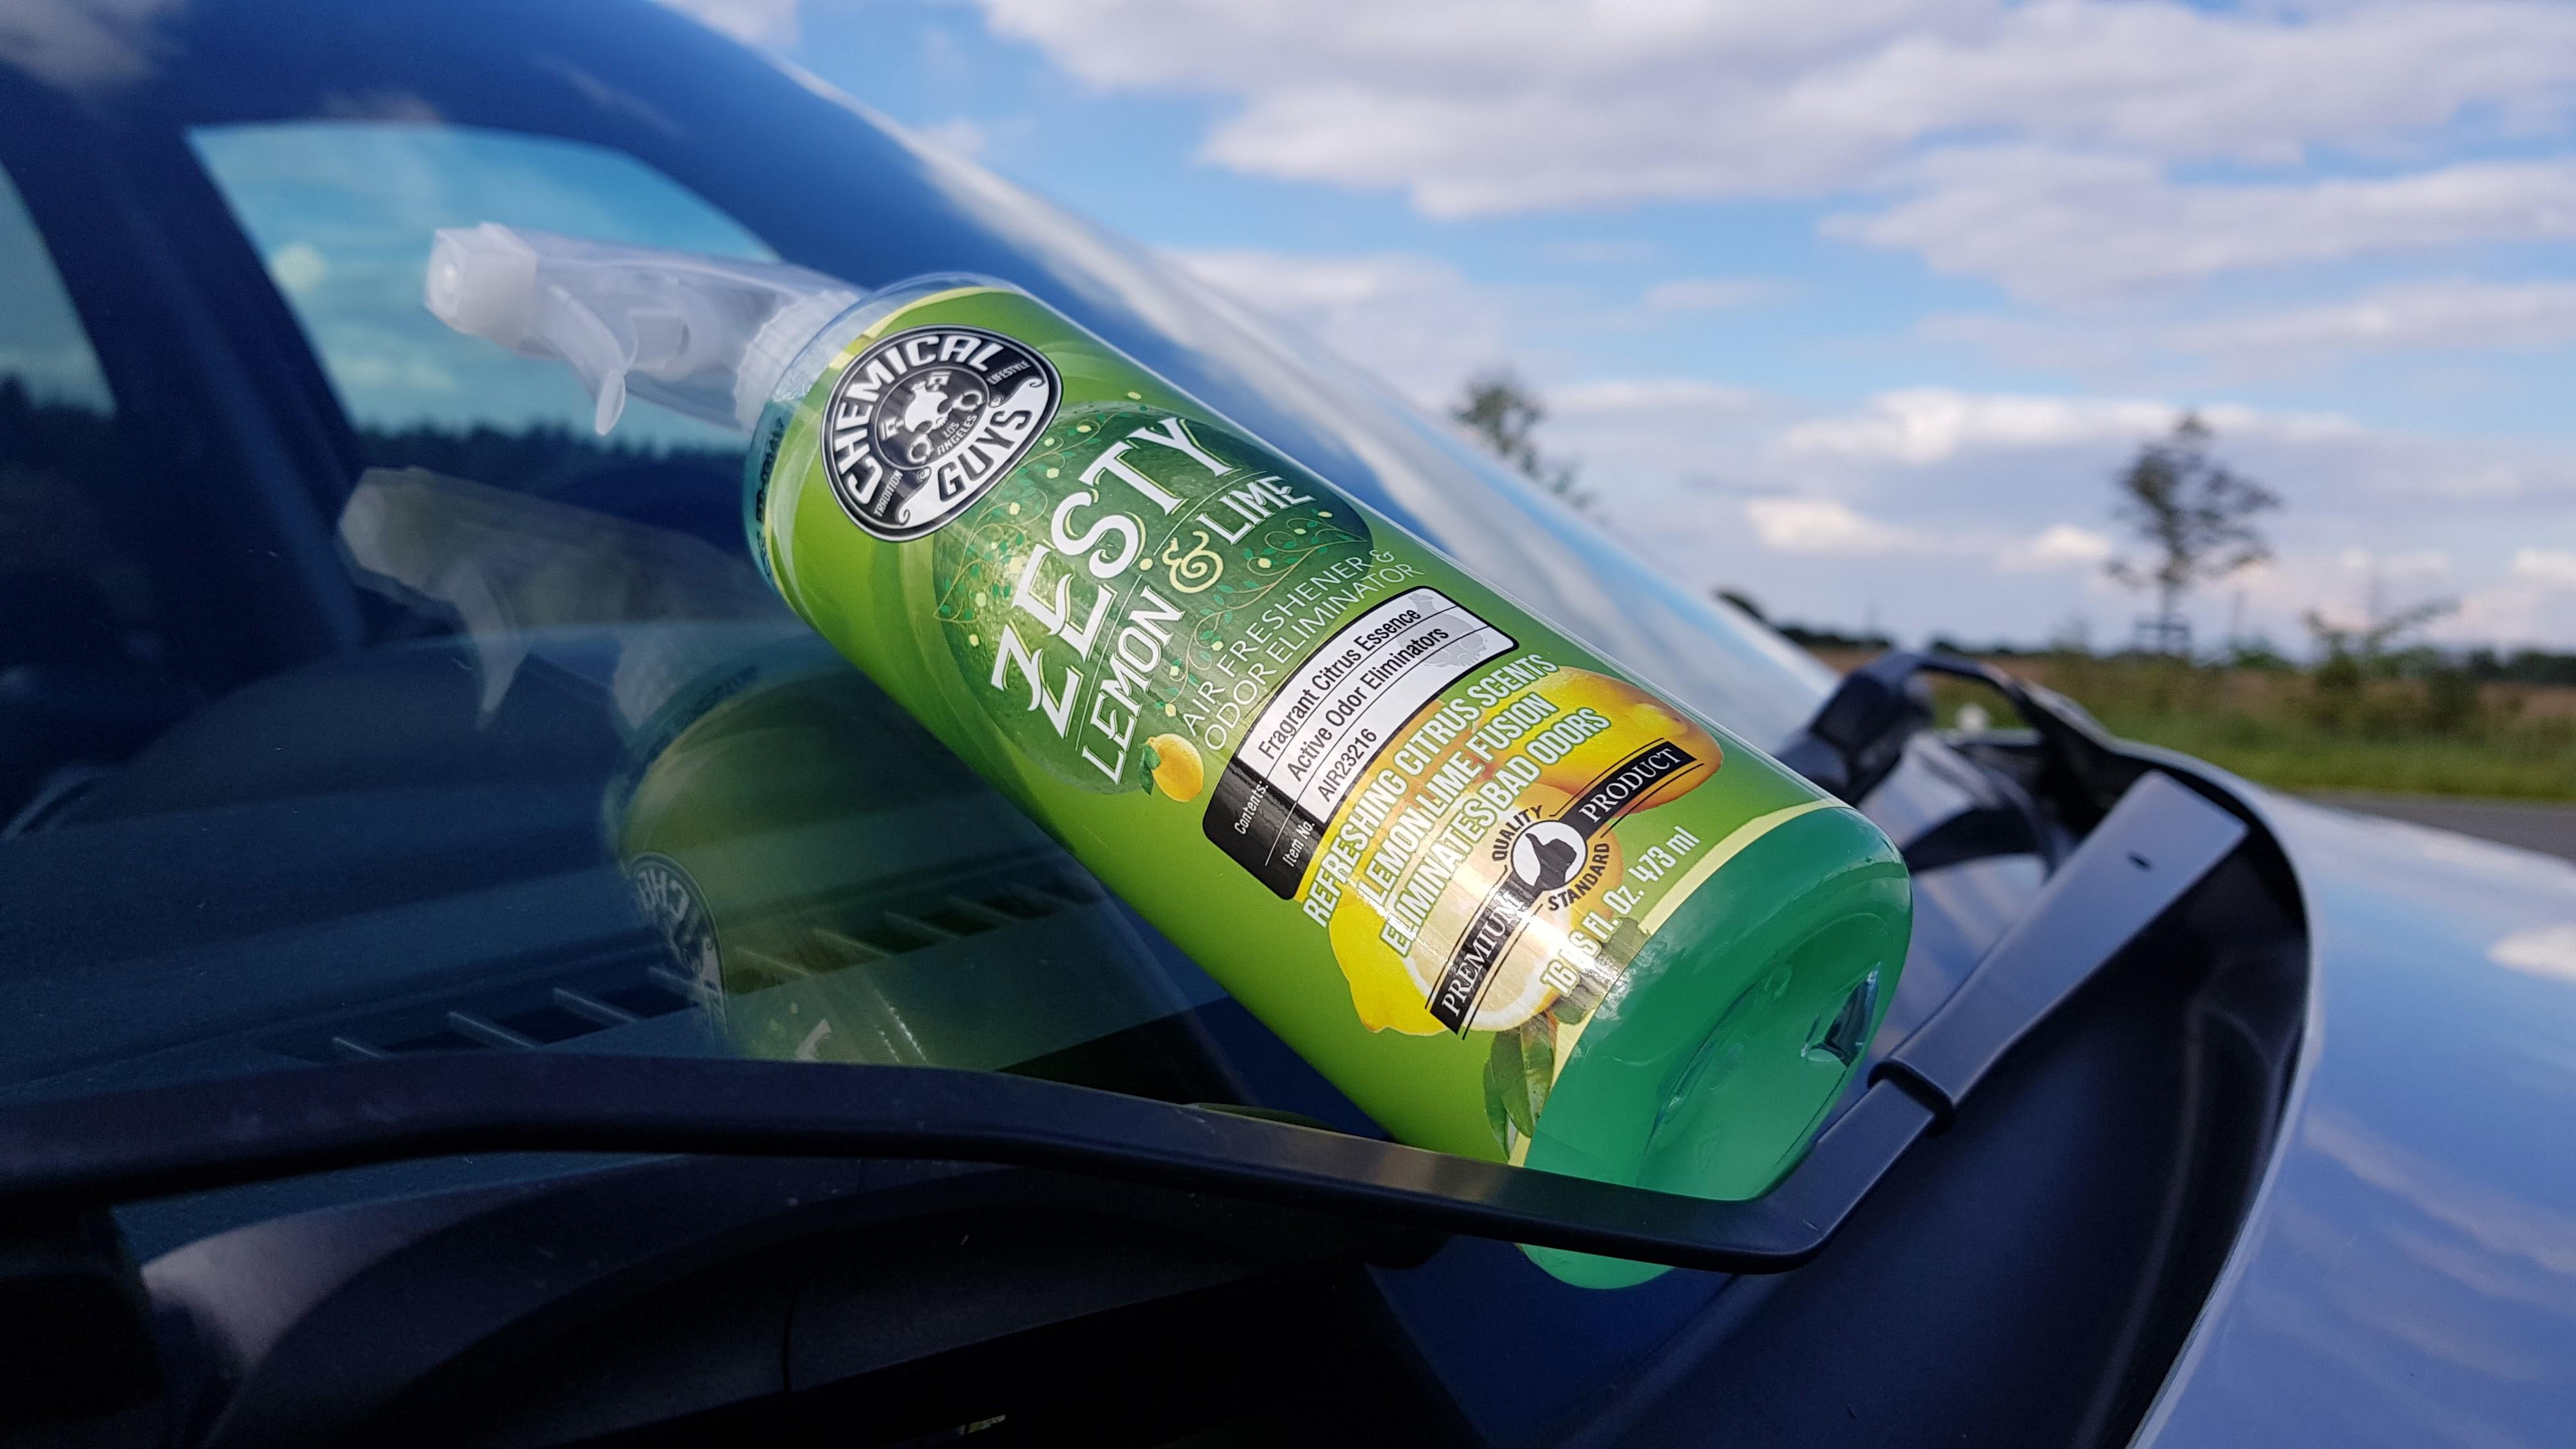 Chemical Guys Zesty Lemon & Lime Scent